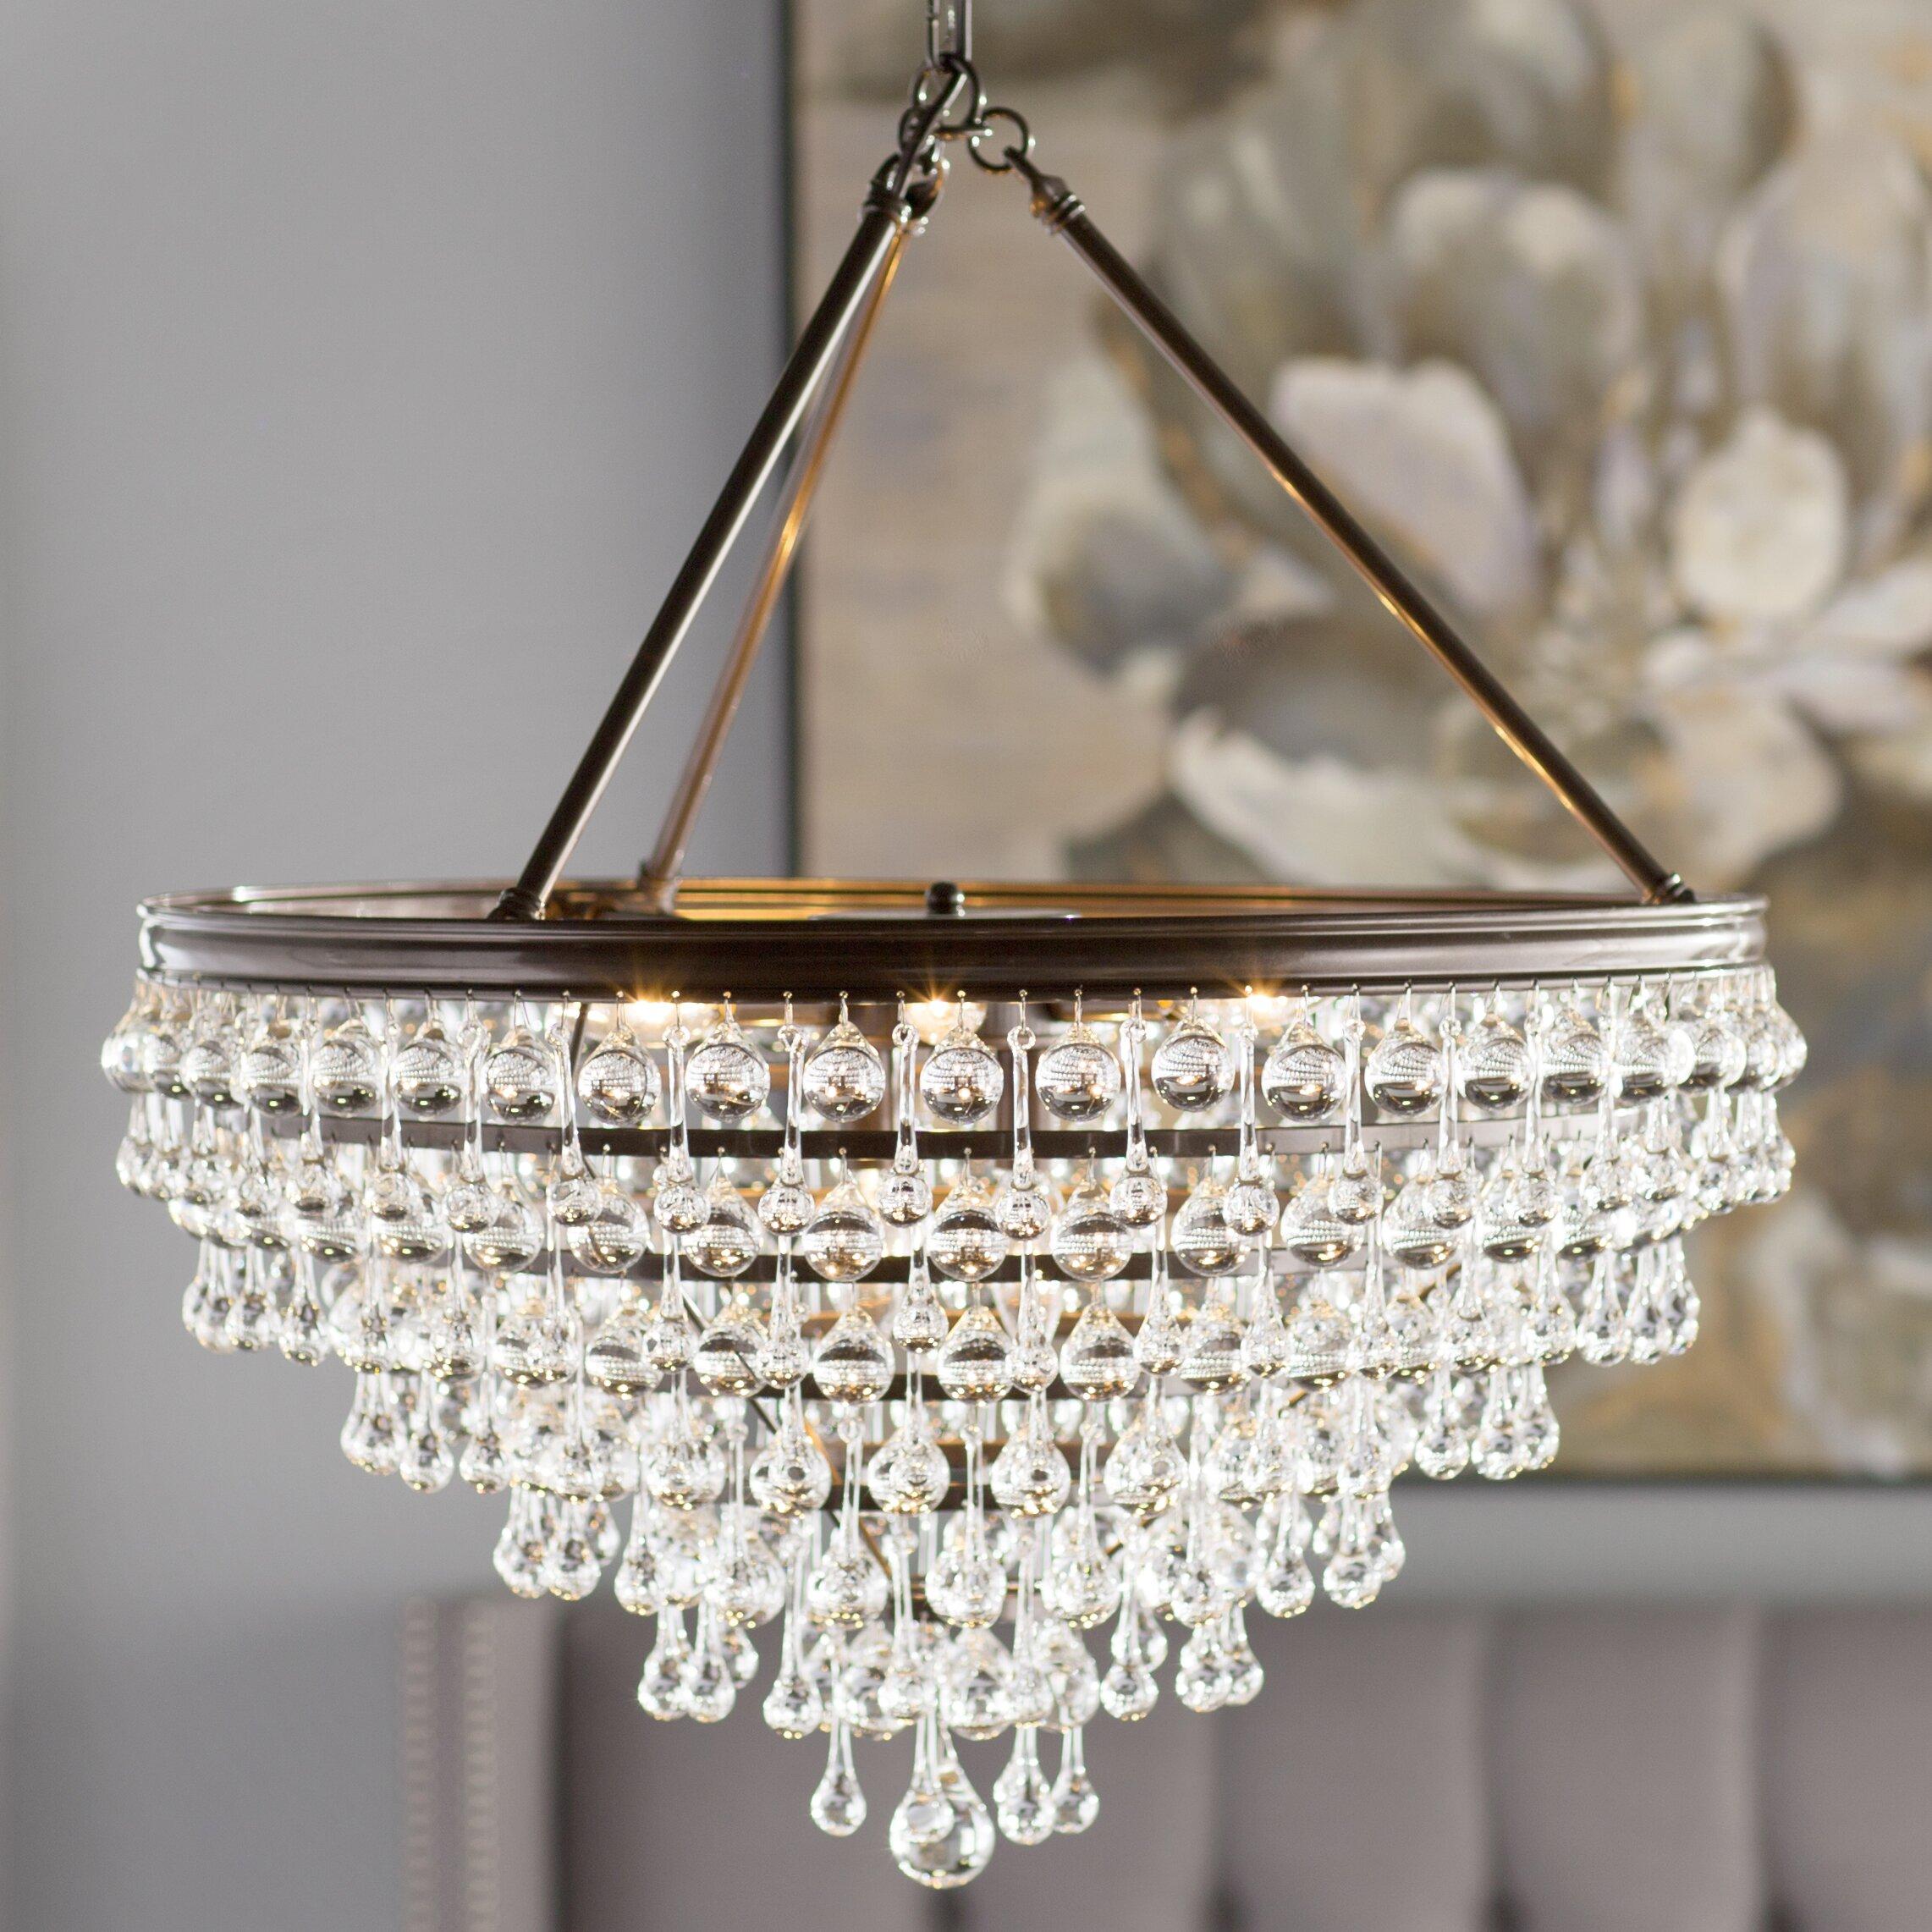 House of Hampton Robertville 8Light Crystal Chandelier Reviews – Crystal Chandelier Lights